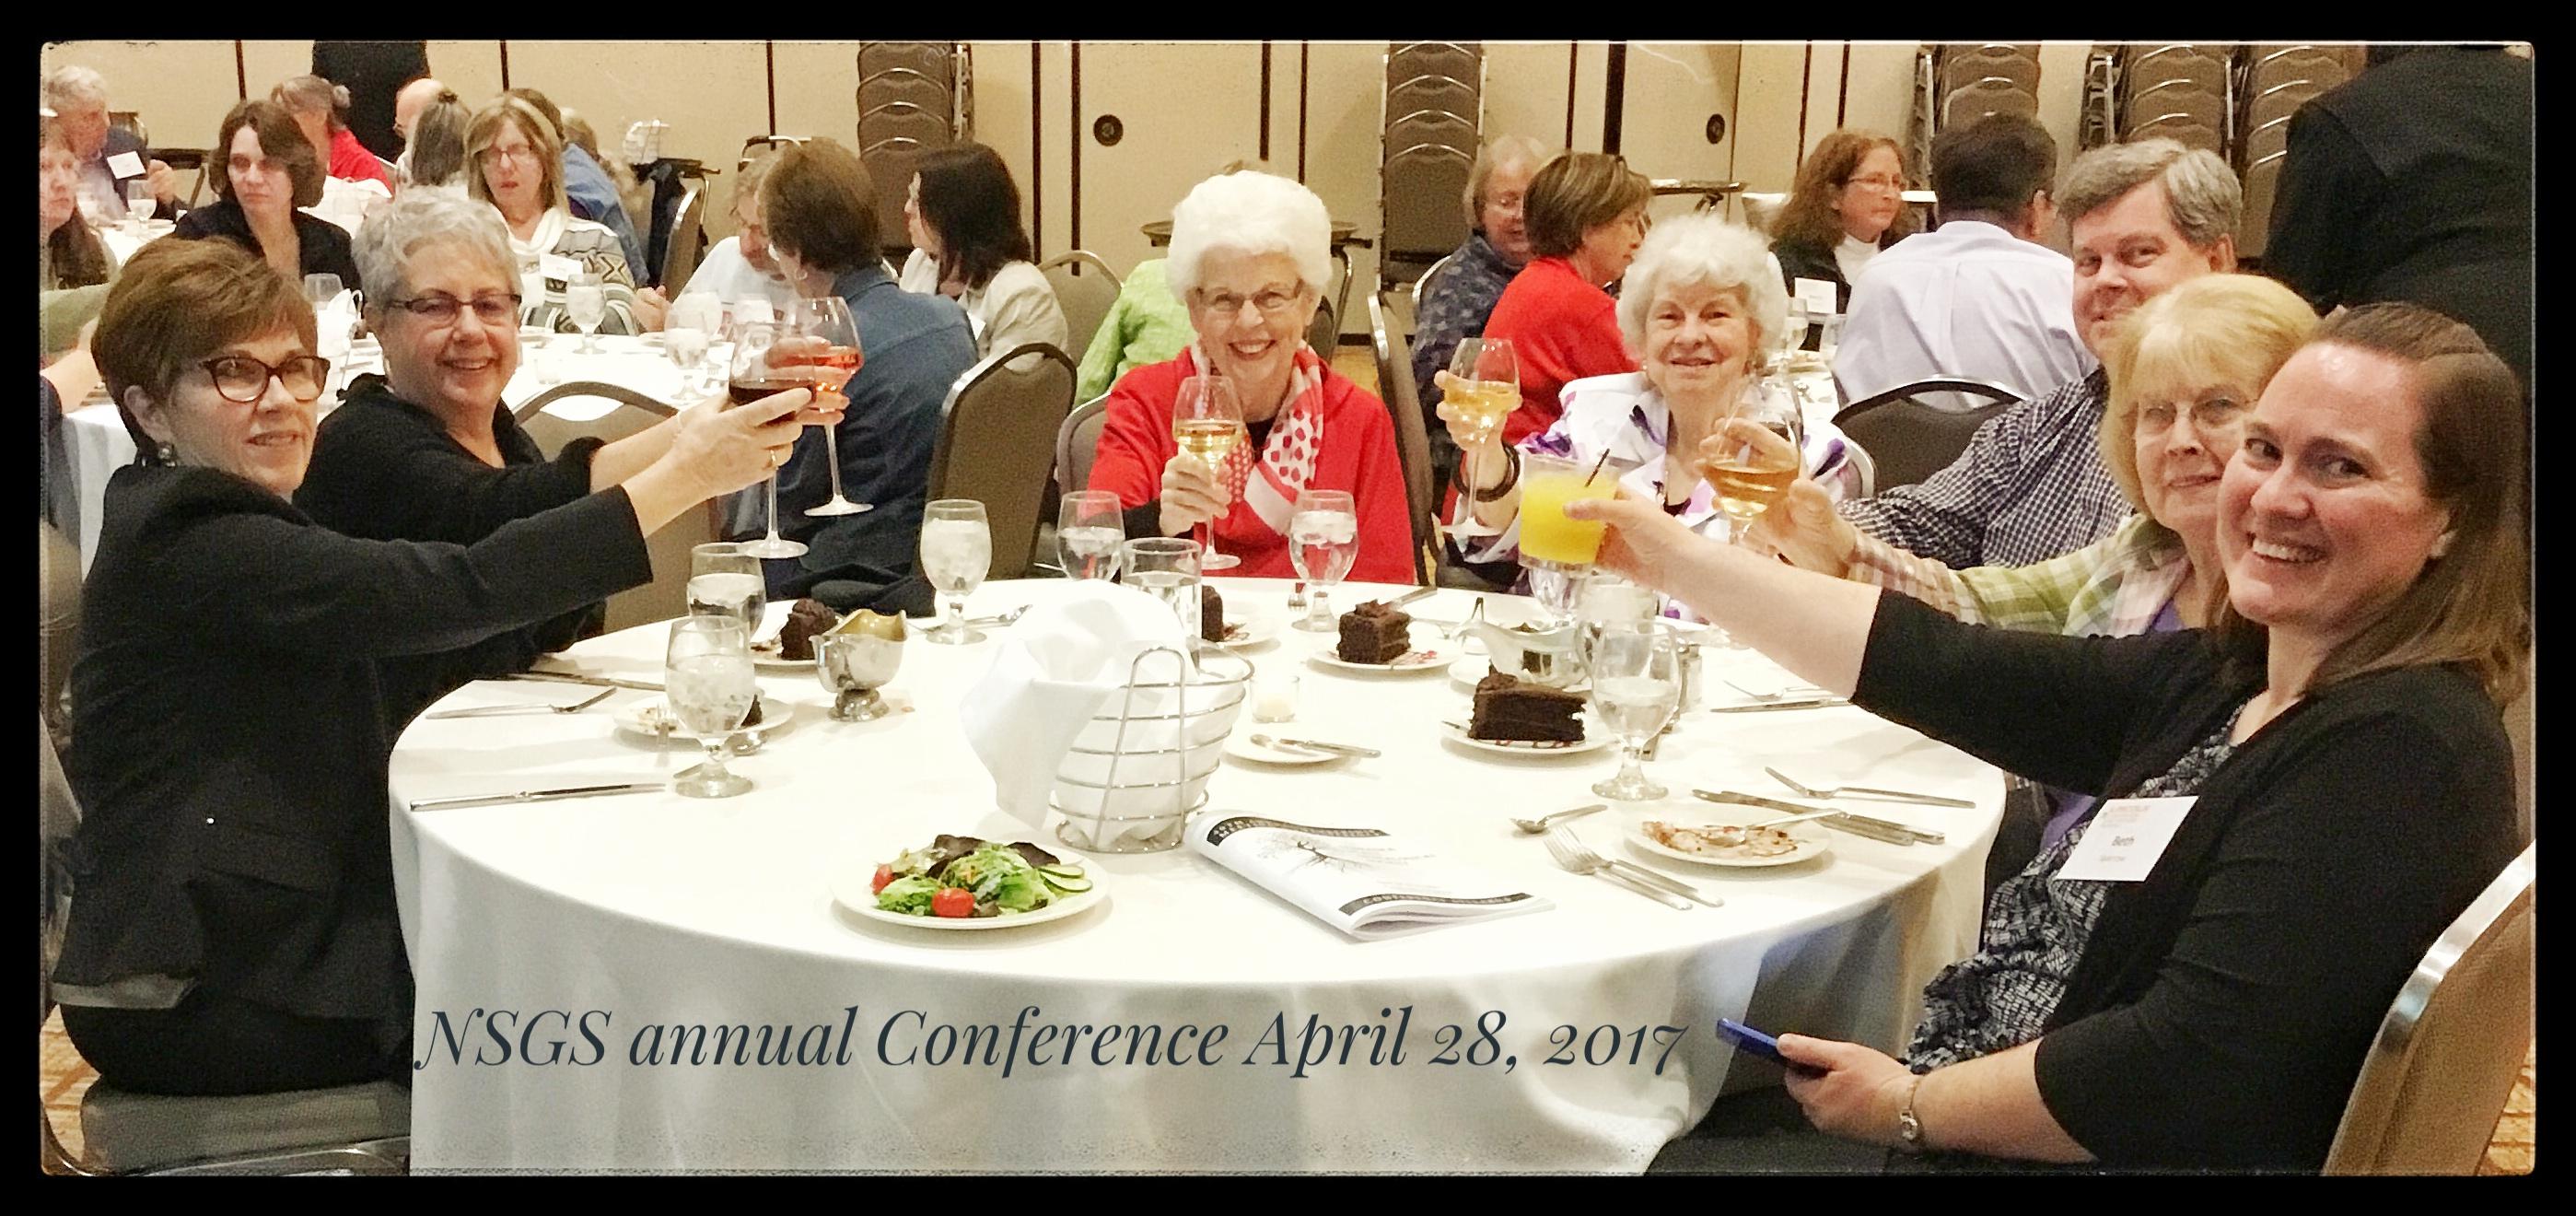 NSGS 2017 Banquet